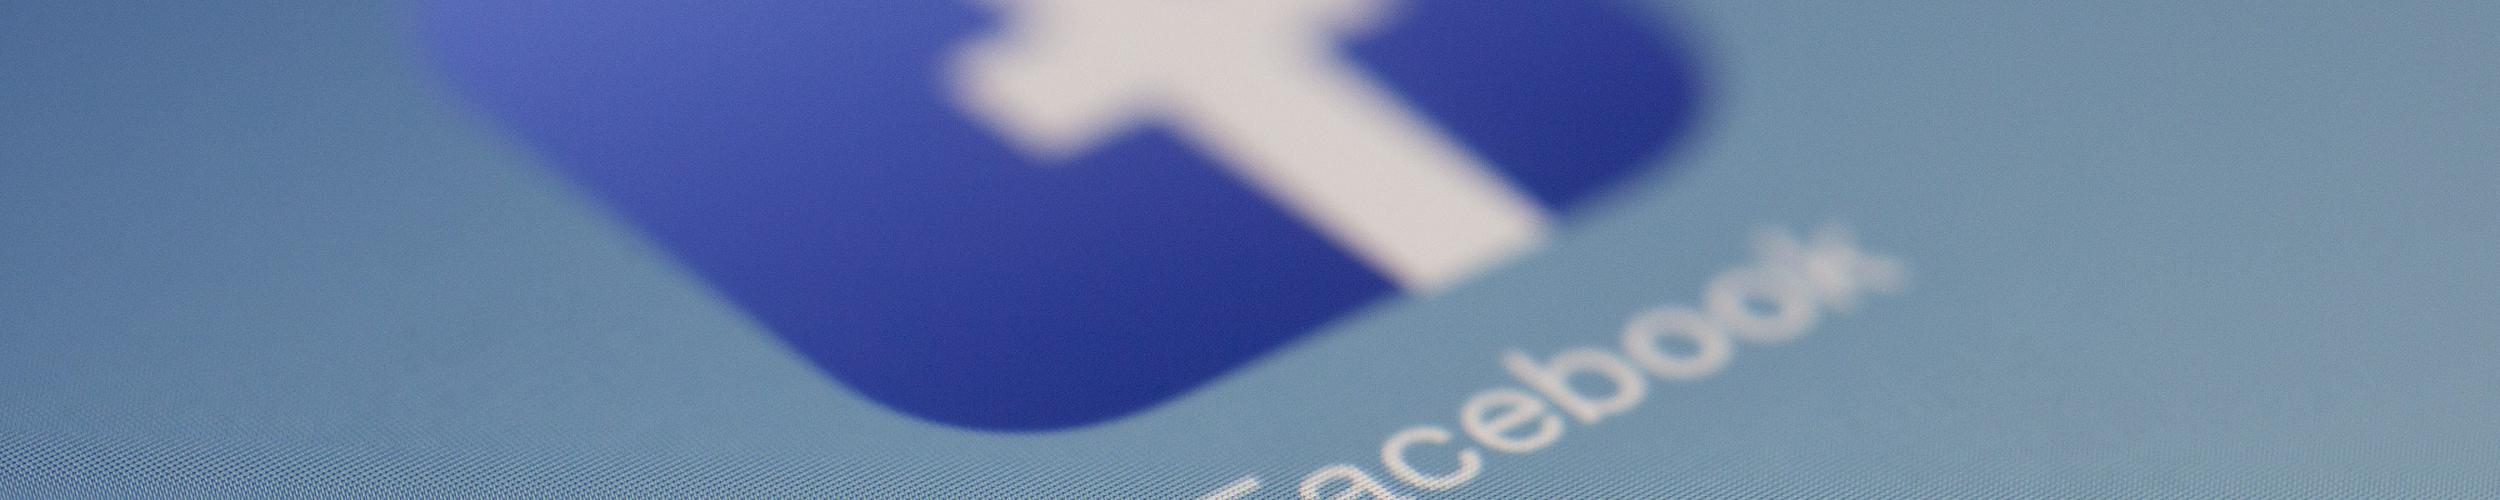 Social media tijdens vakantie